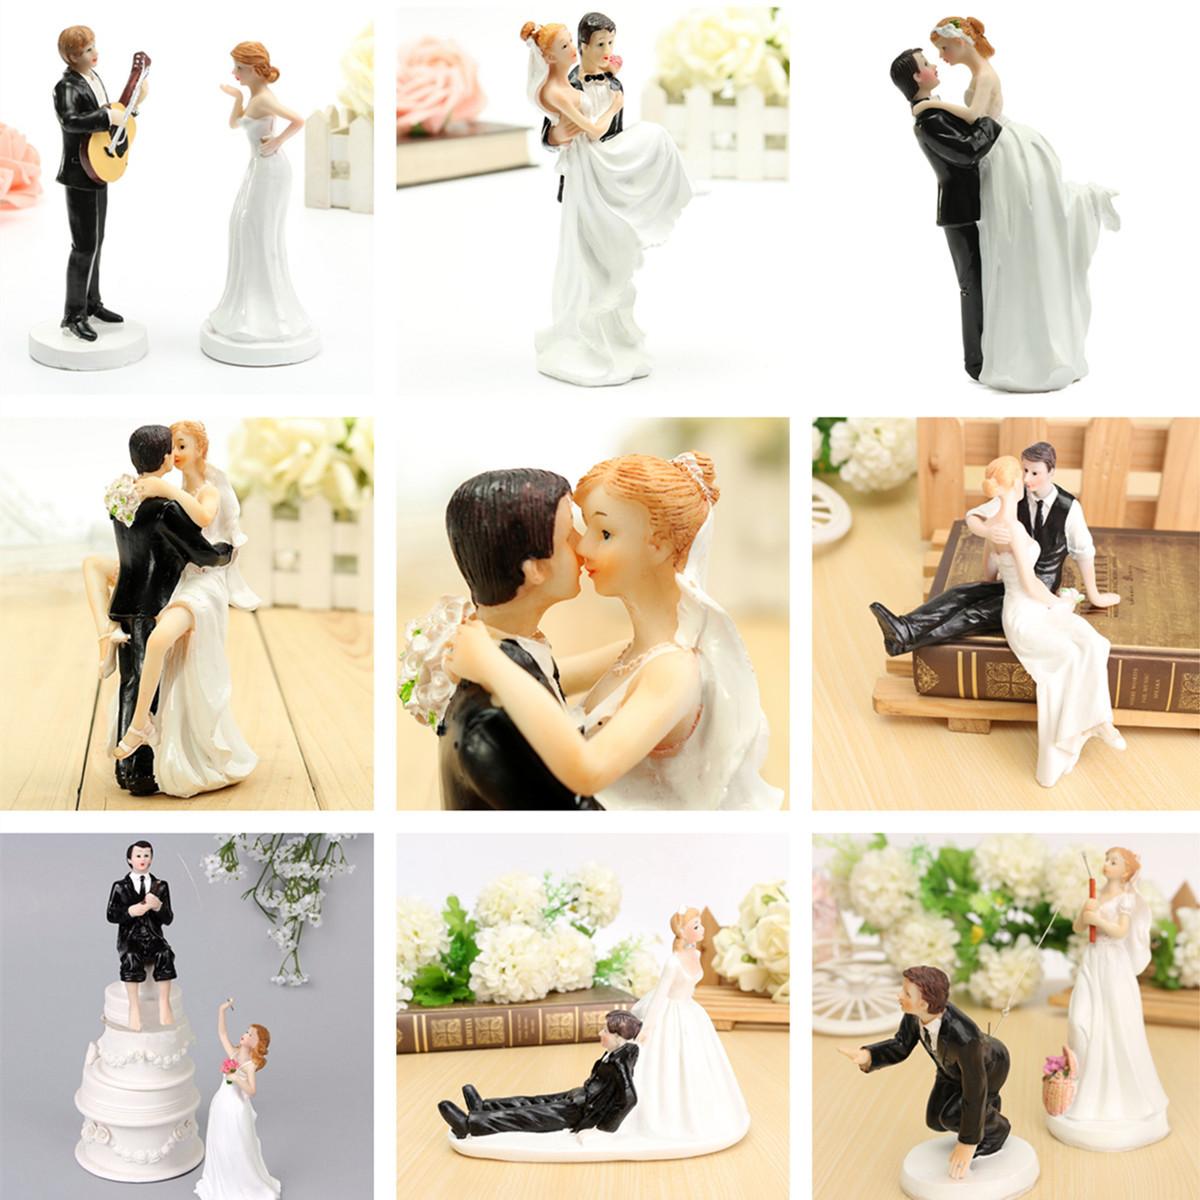 Resin Bride and Groom Couple Figurine Romantic Wedding